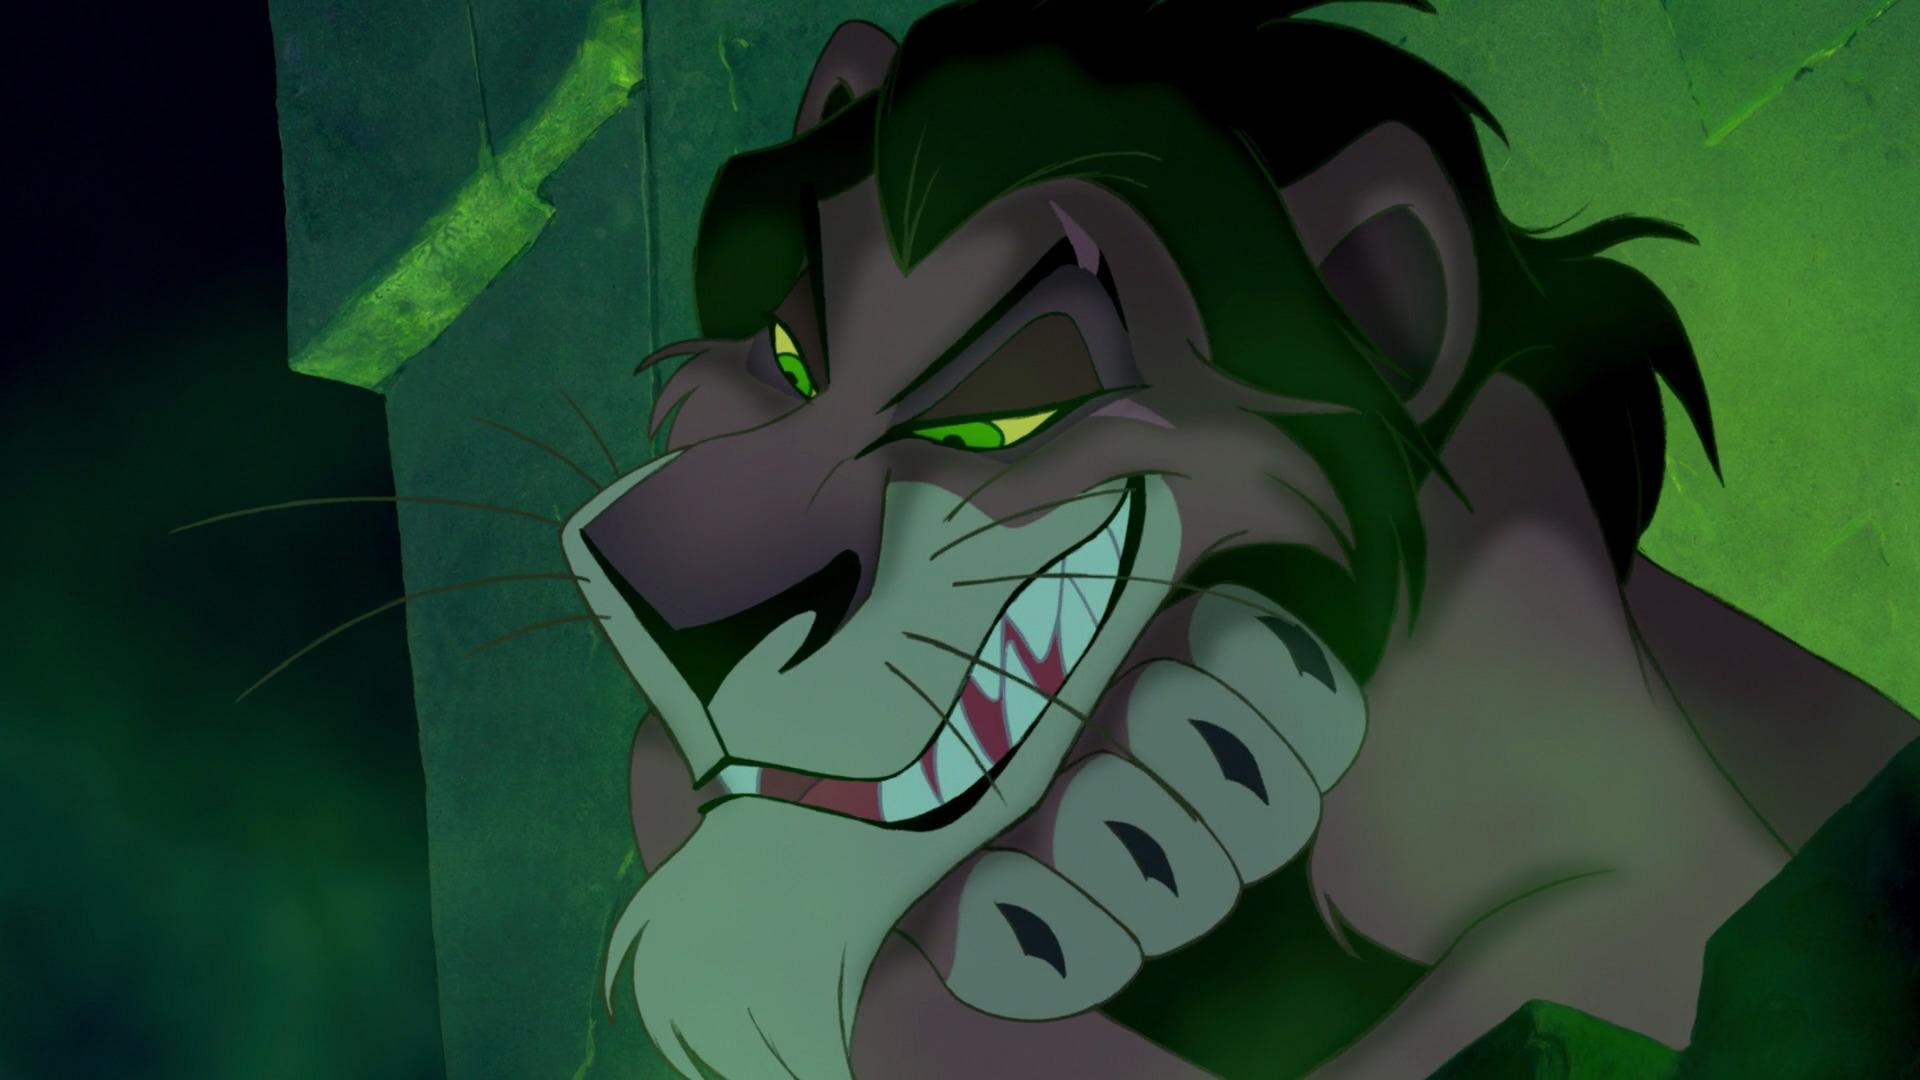 Scar My Disney Villains Wiki Fandom